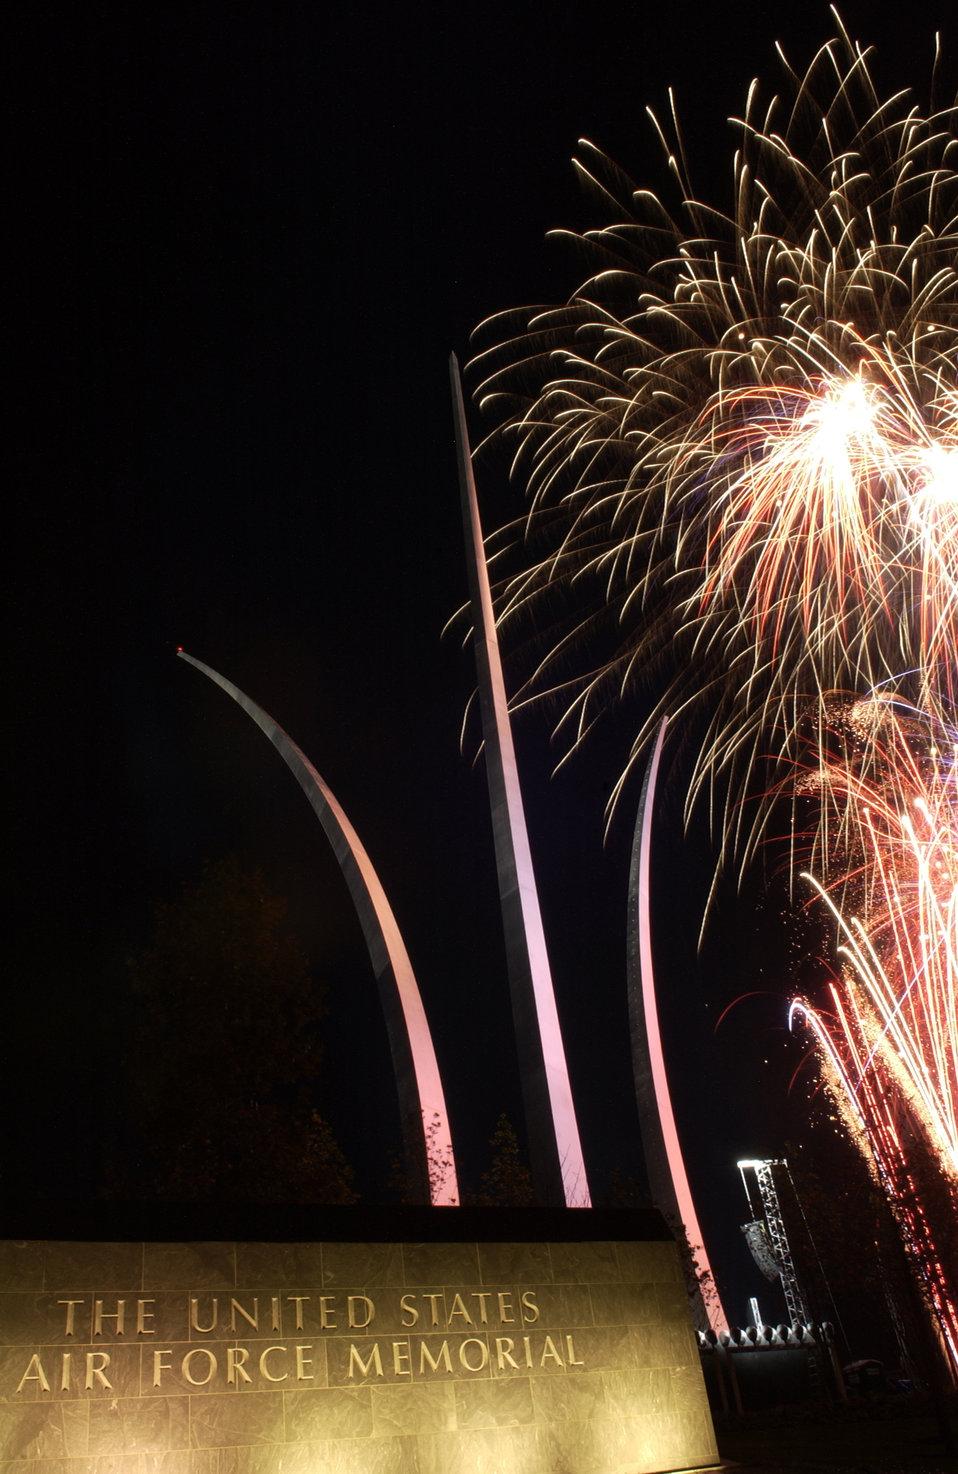 Fireworks light the night sky at memorial dedication event